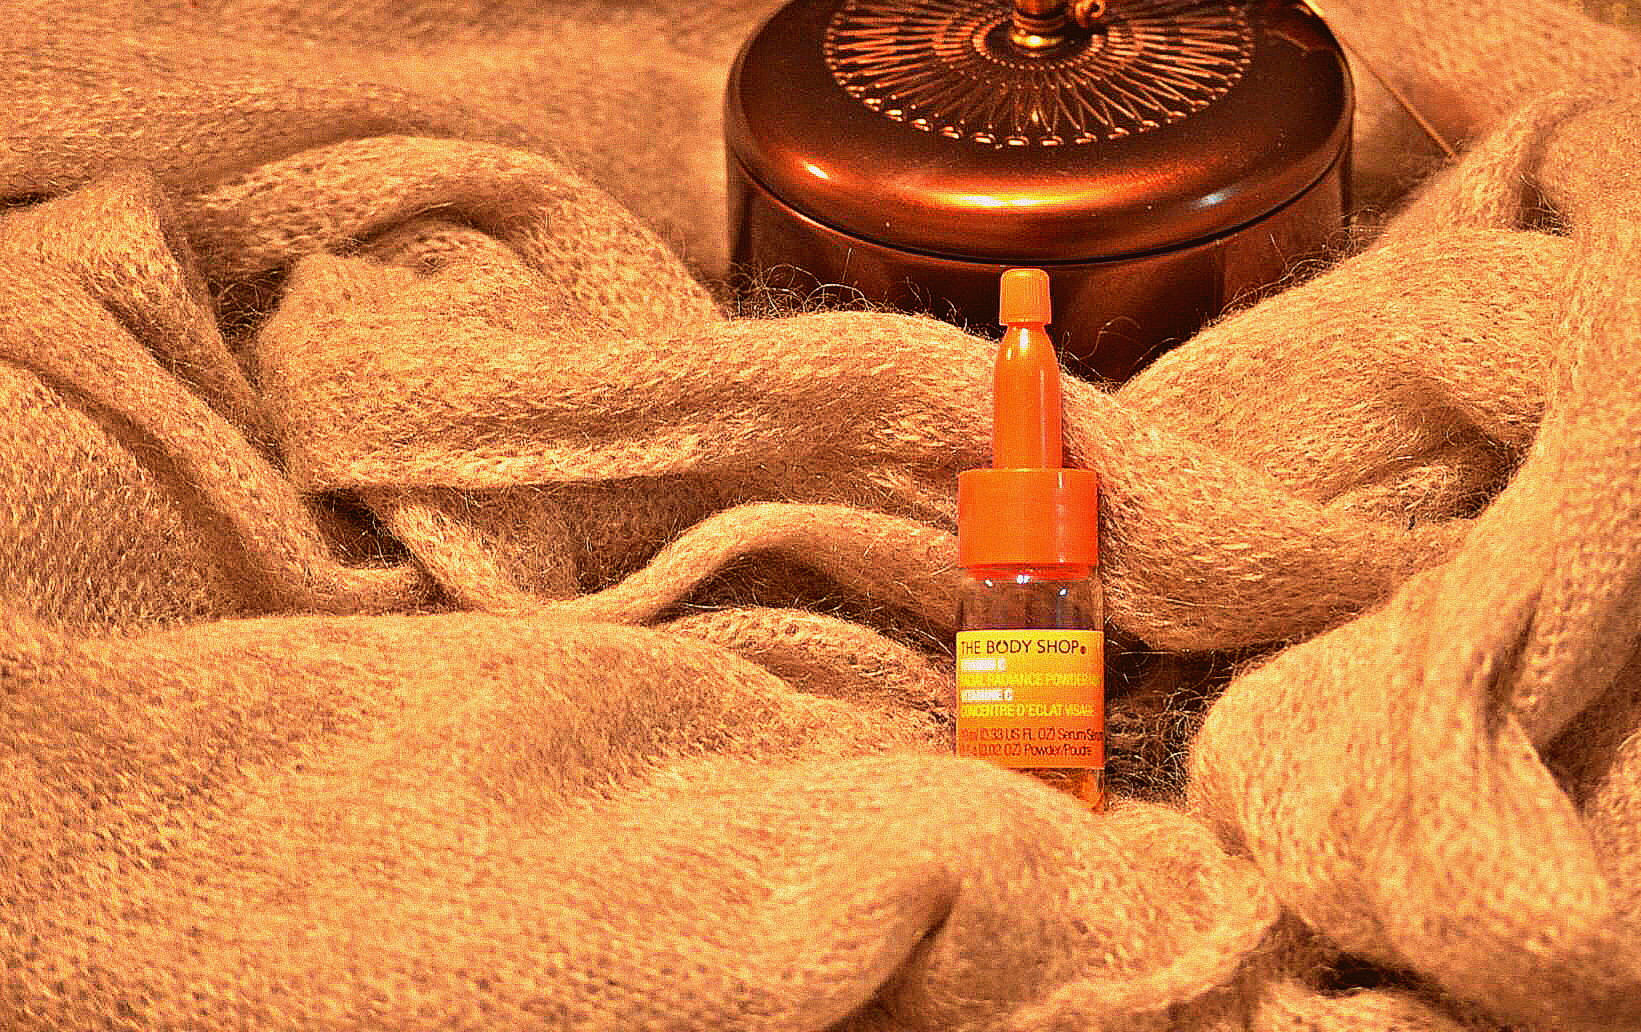 img 8434 - Vitamin C Skin Care Body Shop Review